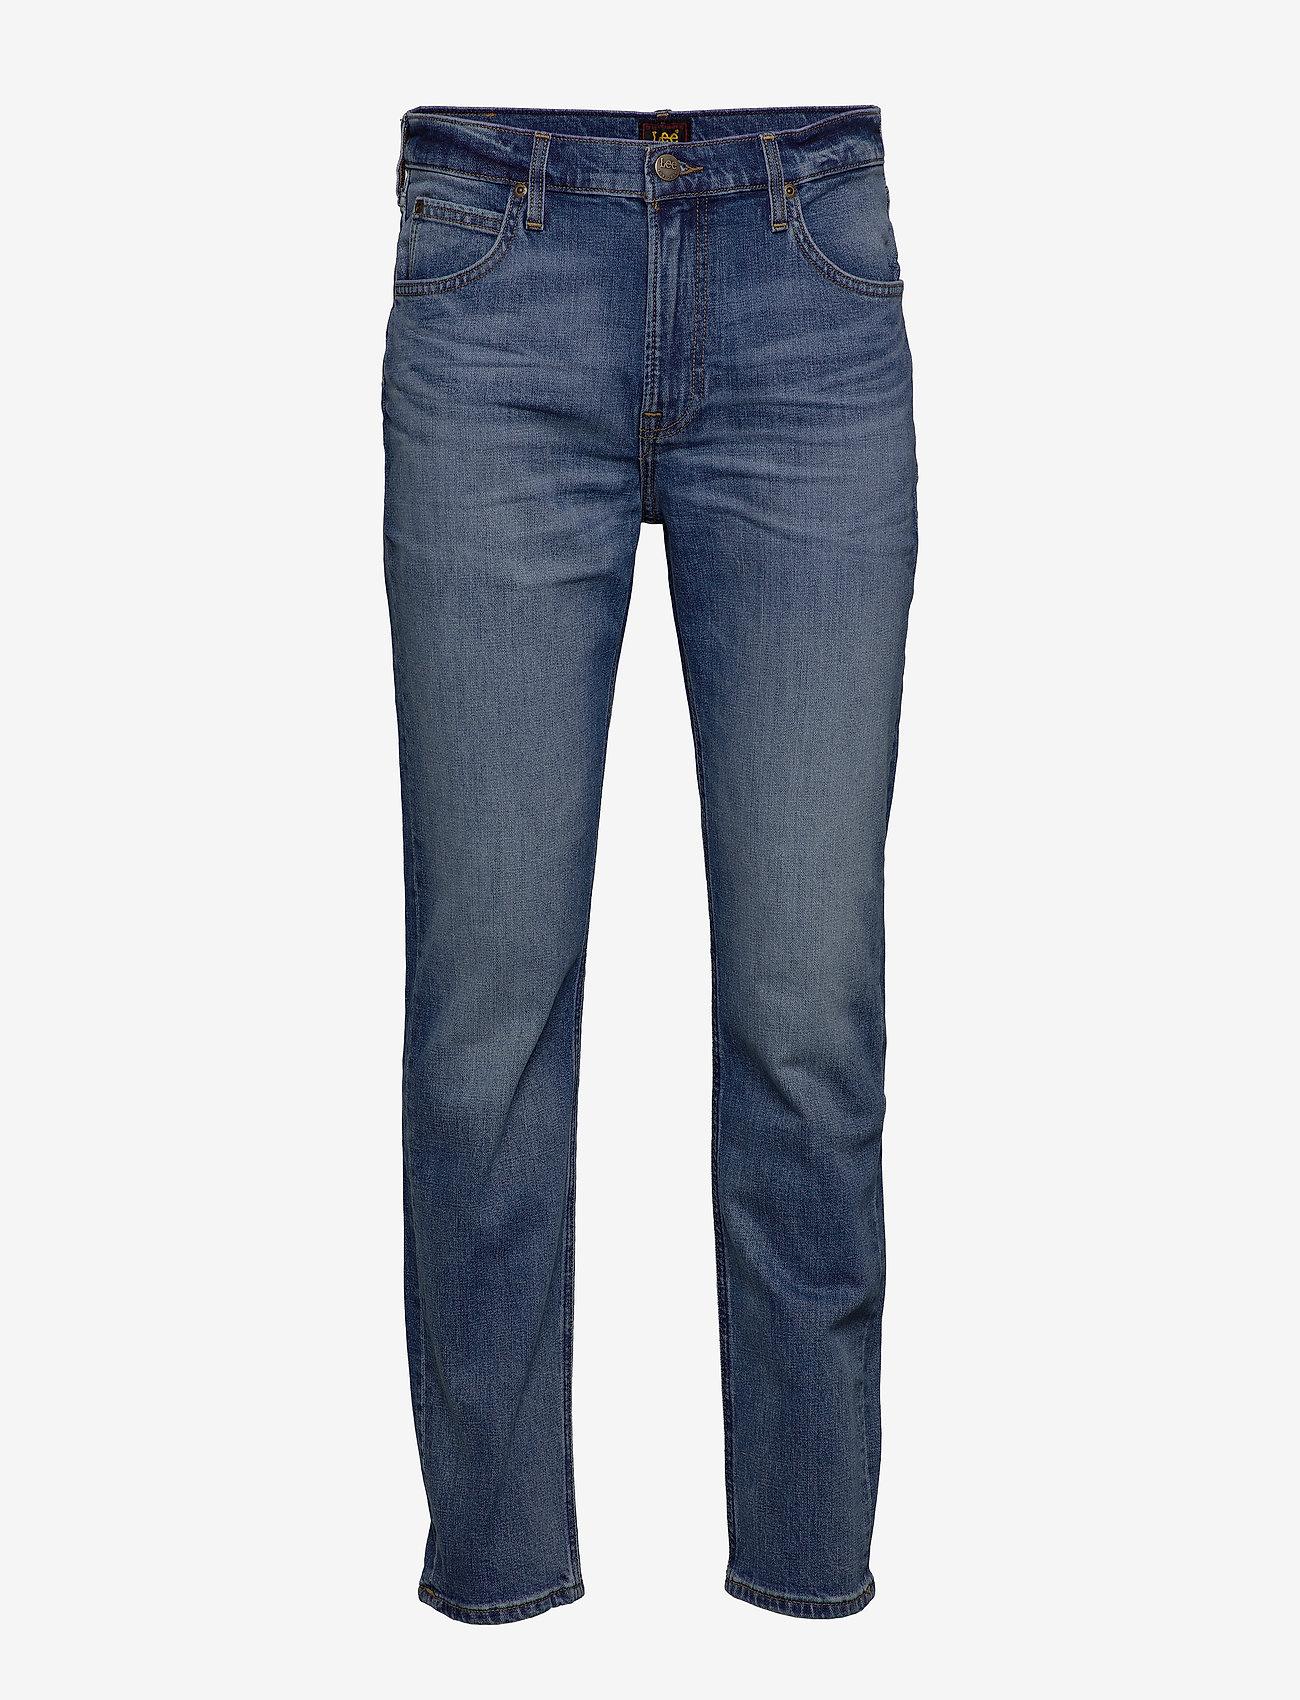 Lee Jeans - AUSTIN - regular jeans - mid kansas - 0